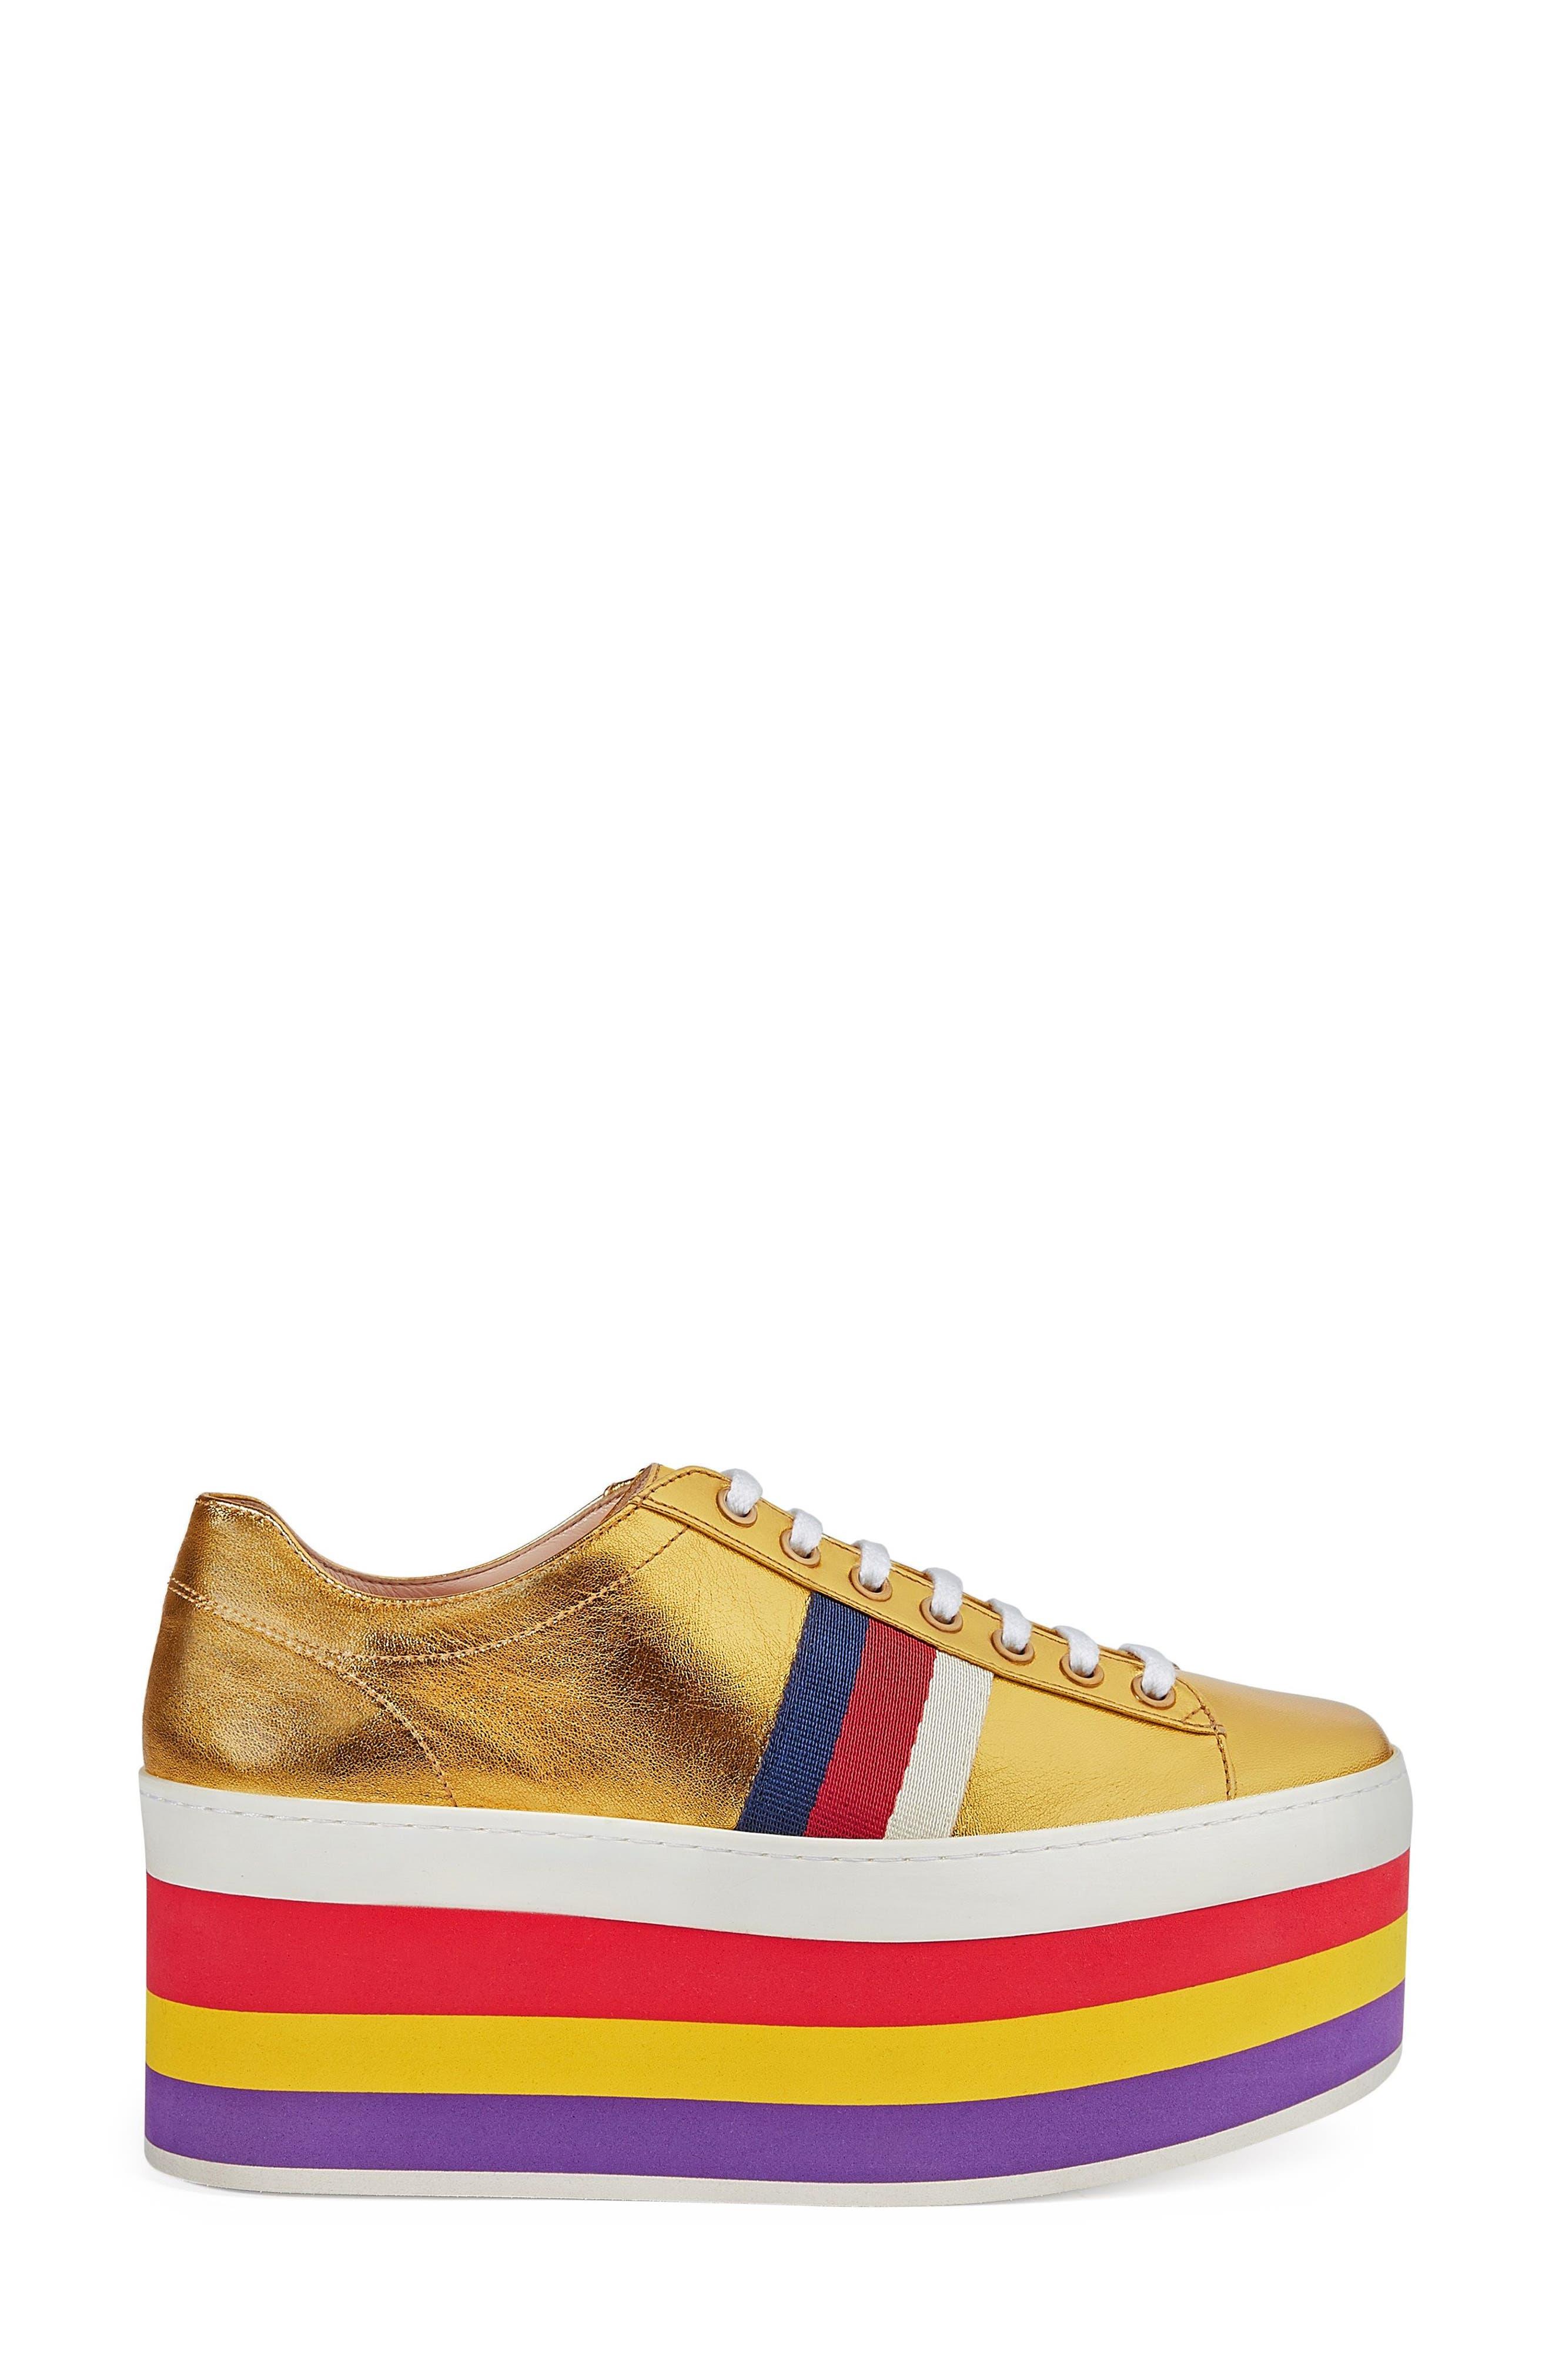 Main Image - Gucci Peggy Flatform Sneaker (Women)